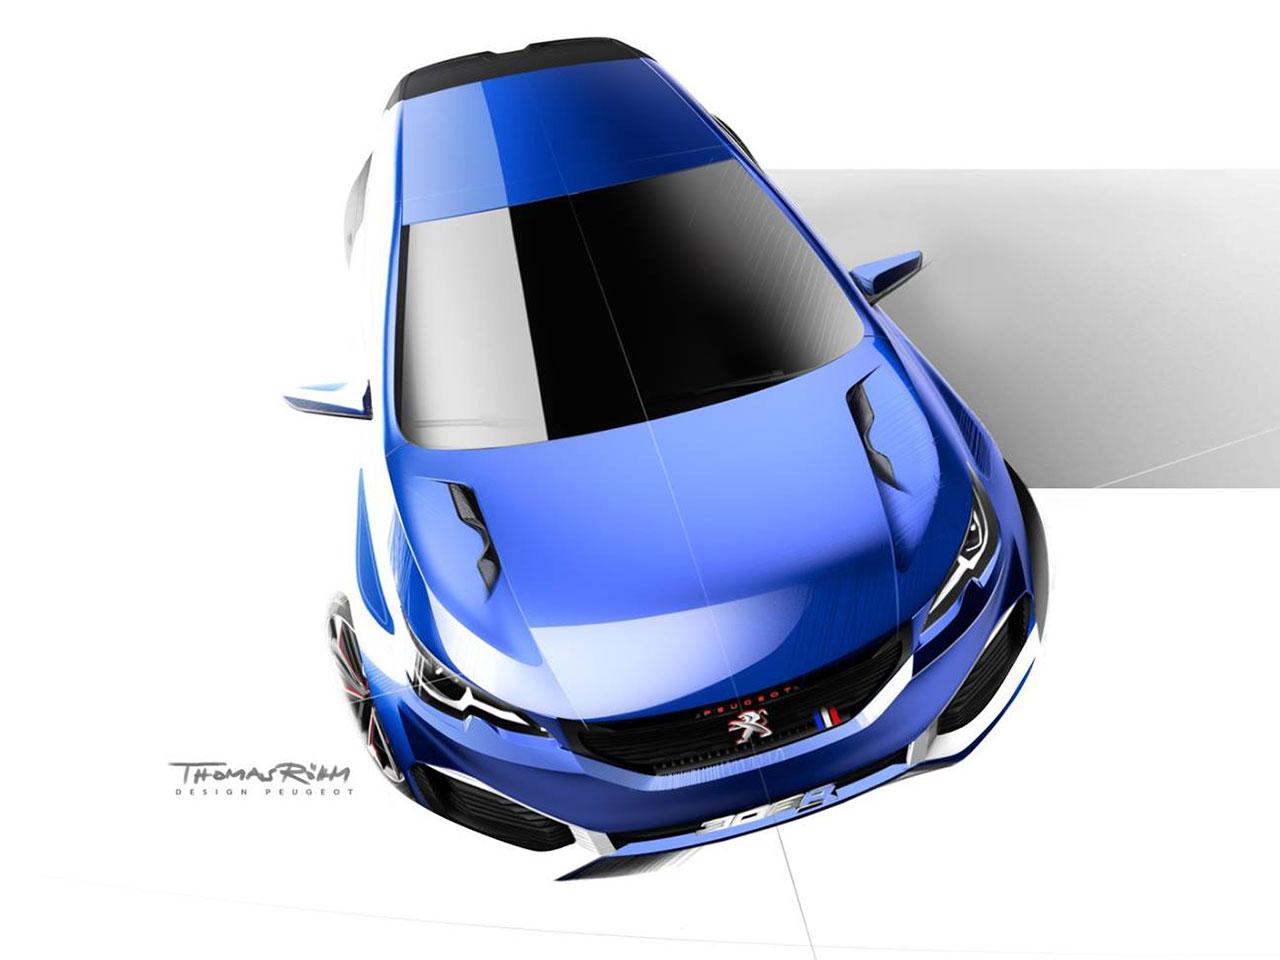 Peugeot 308 R HYbrid - Sketch: front / avant - by Thomas Rohm